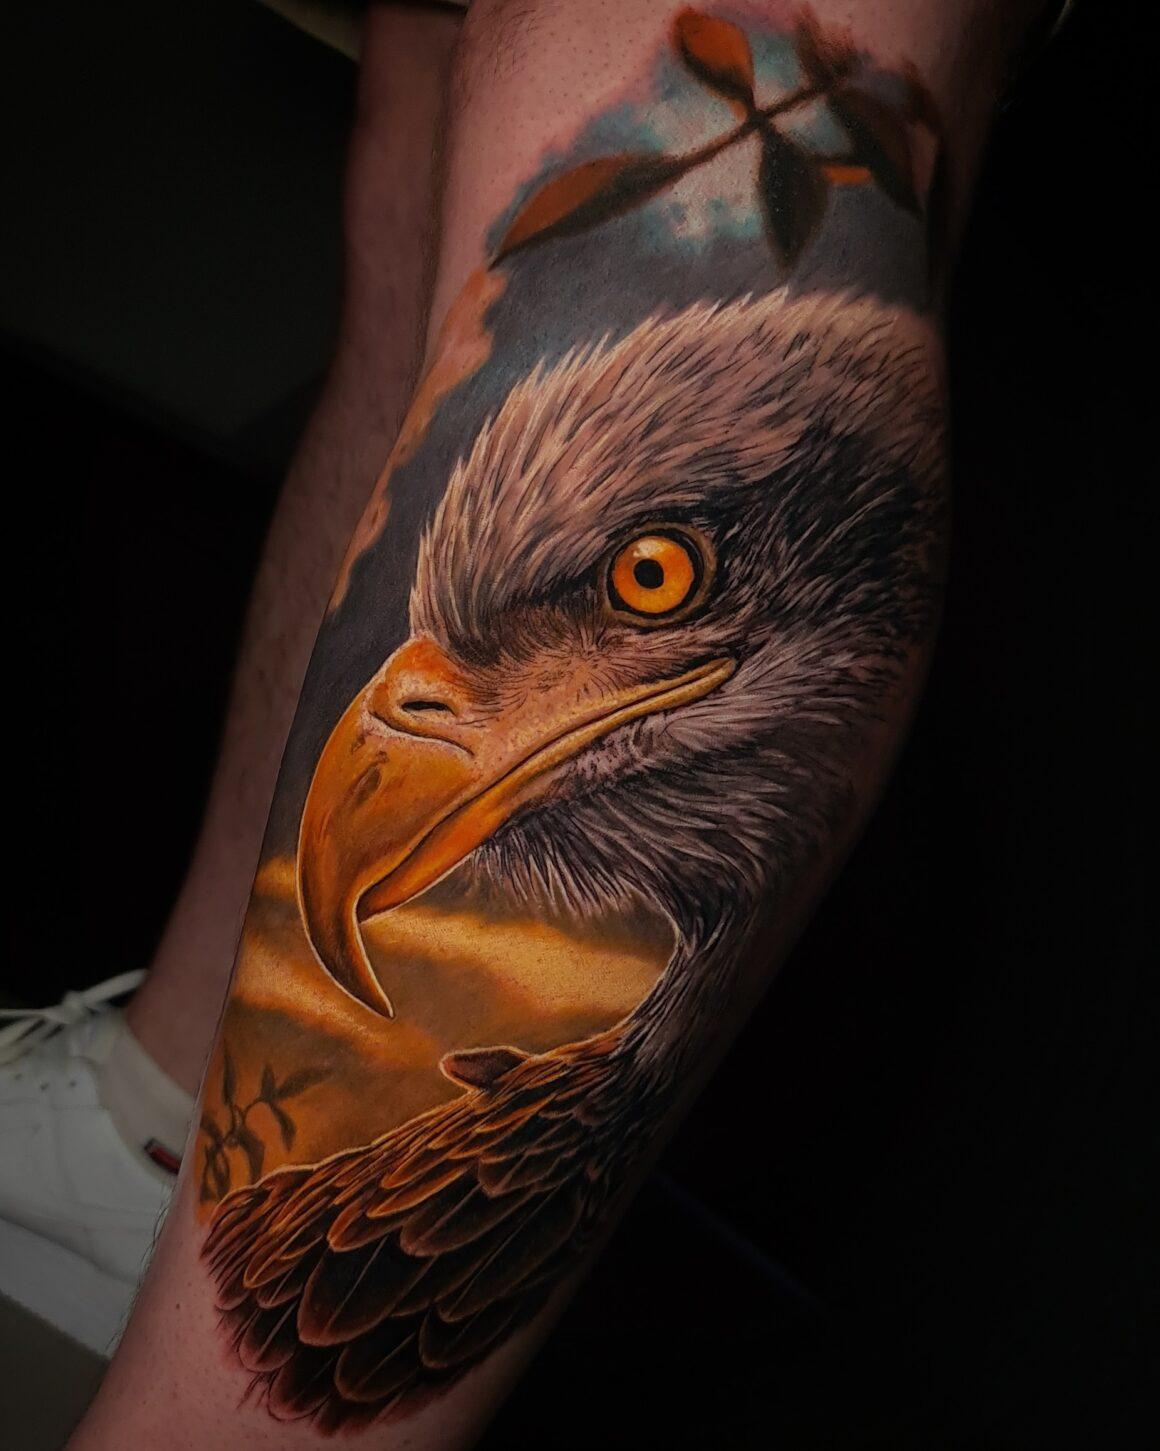 Livio Cuci, Memorink Tattoo Studio, Brescia